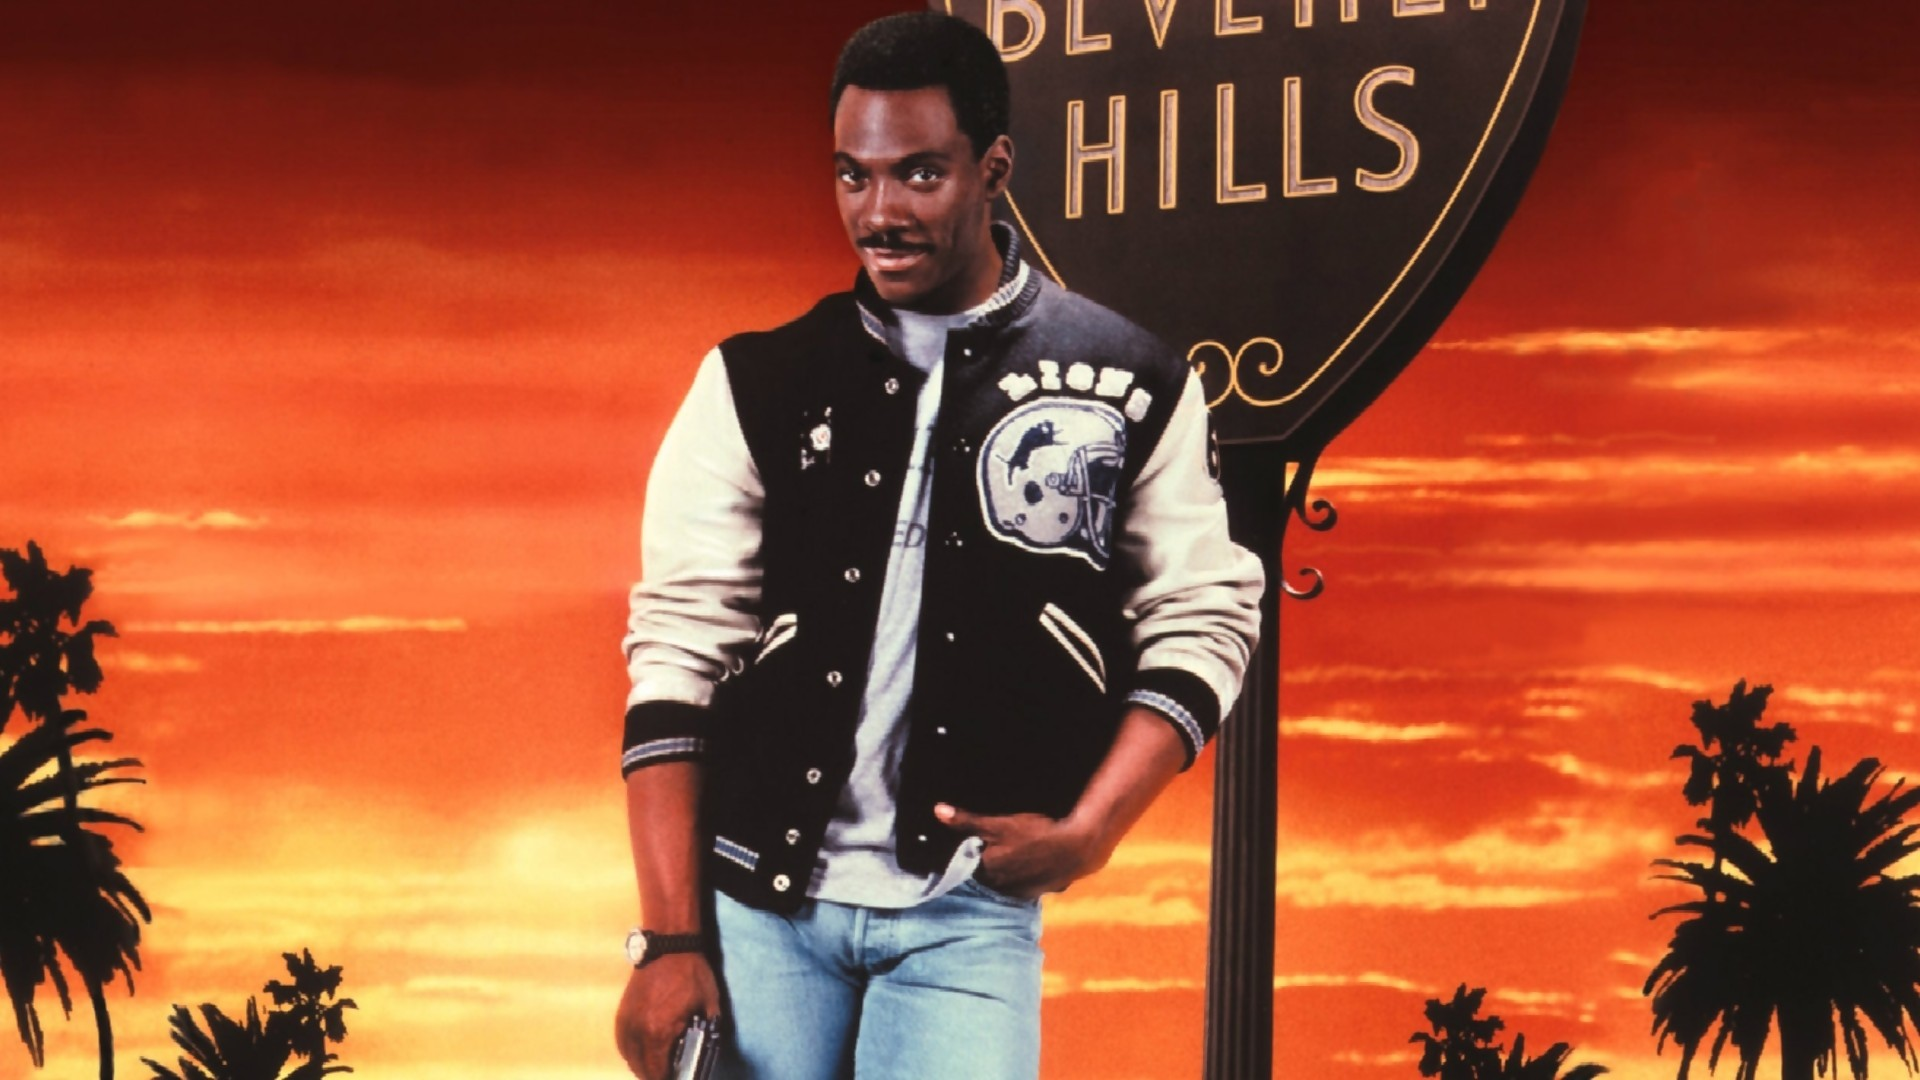 Beverly Hills Cop II 1987  IMDb